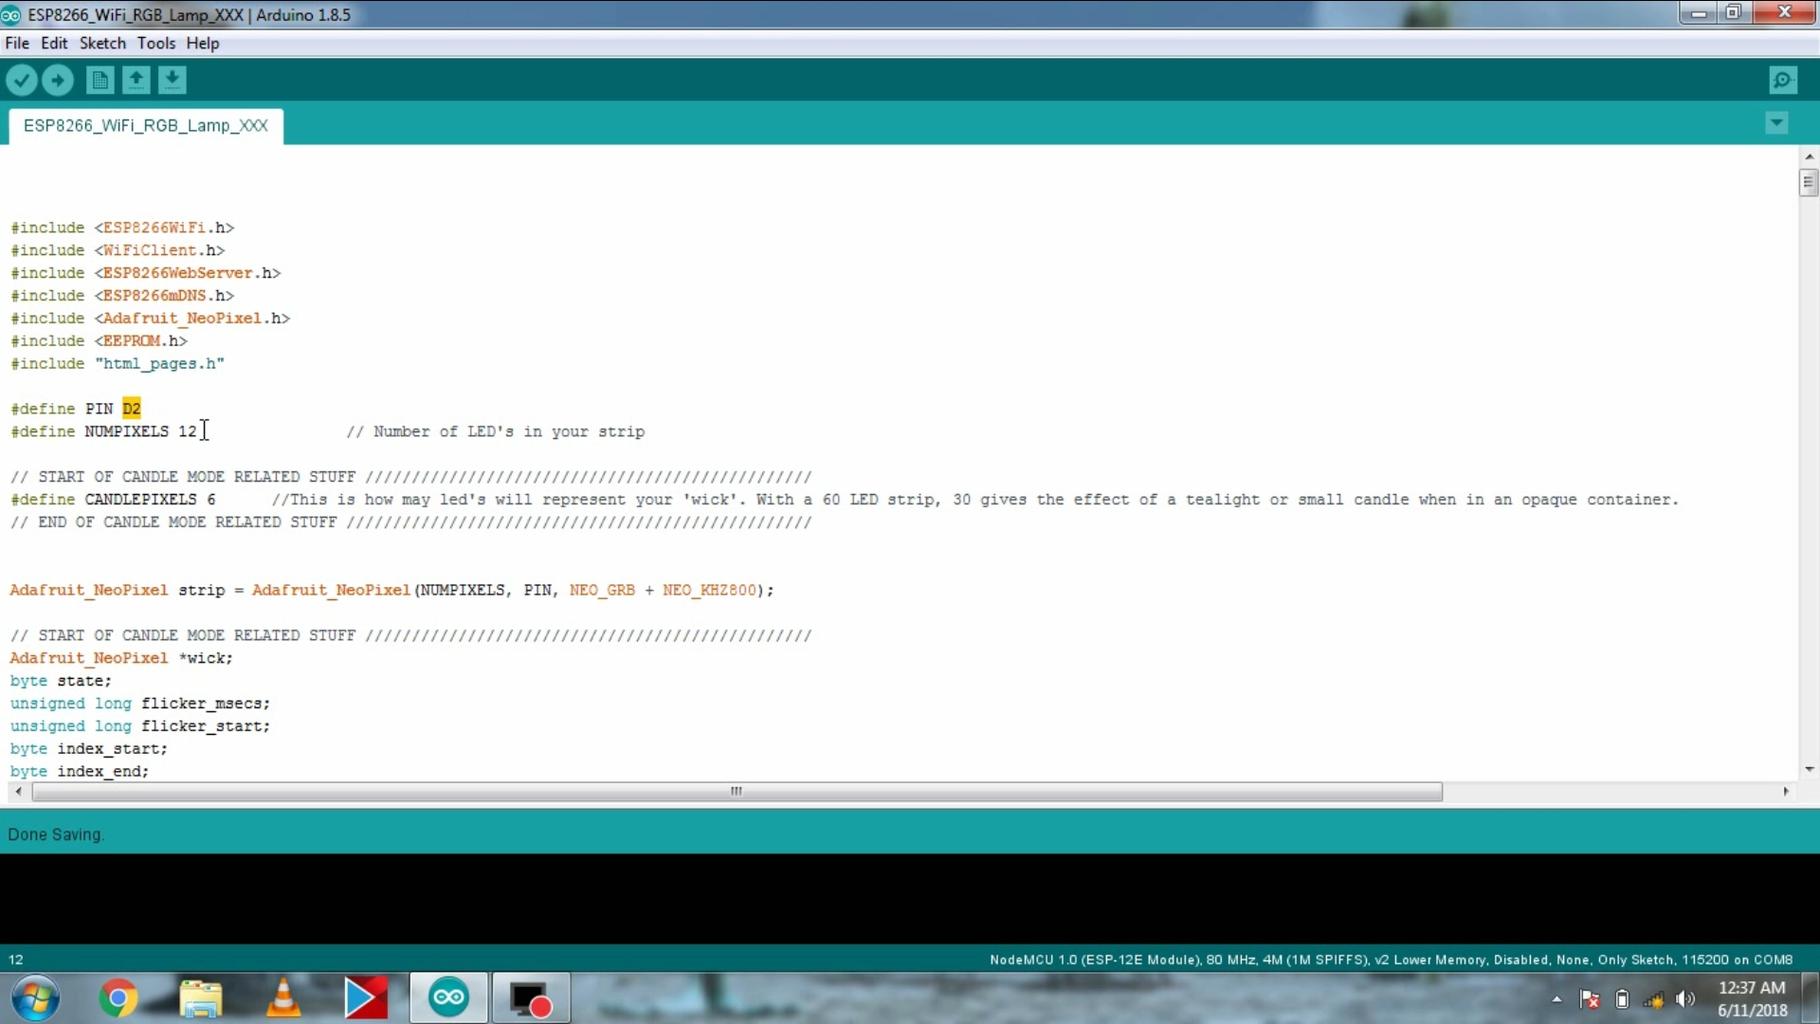 Upload Code